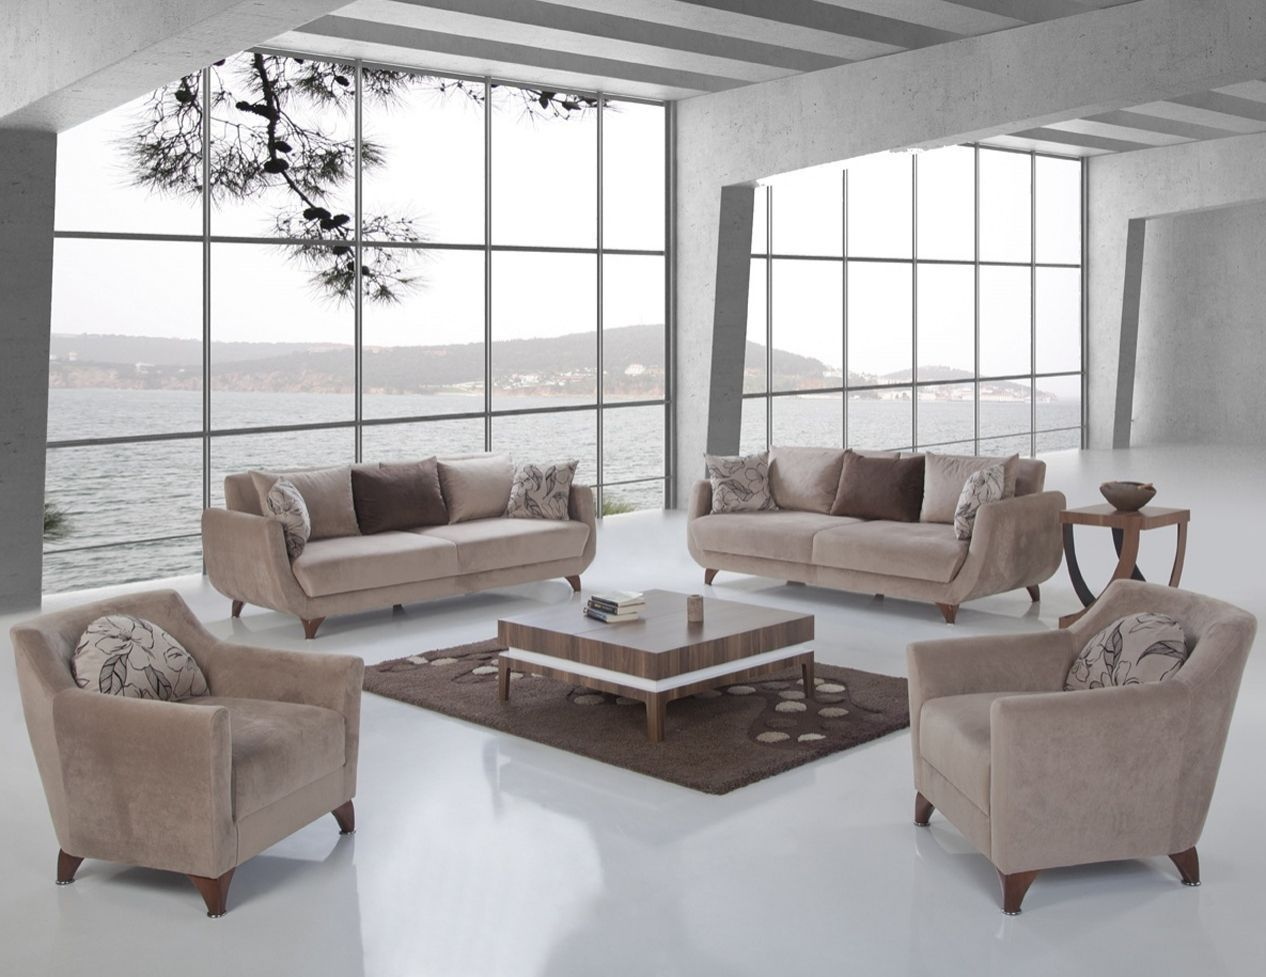 Oturma Odasi Ruya Koltuk Takimi Tesettur Salvar Modelleri 2020 Tesettur Salvar Modelleri 2020 In 2020 Dream Furniture Sofa Decor Rustic Sofa